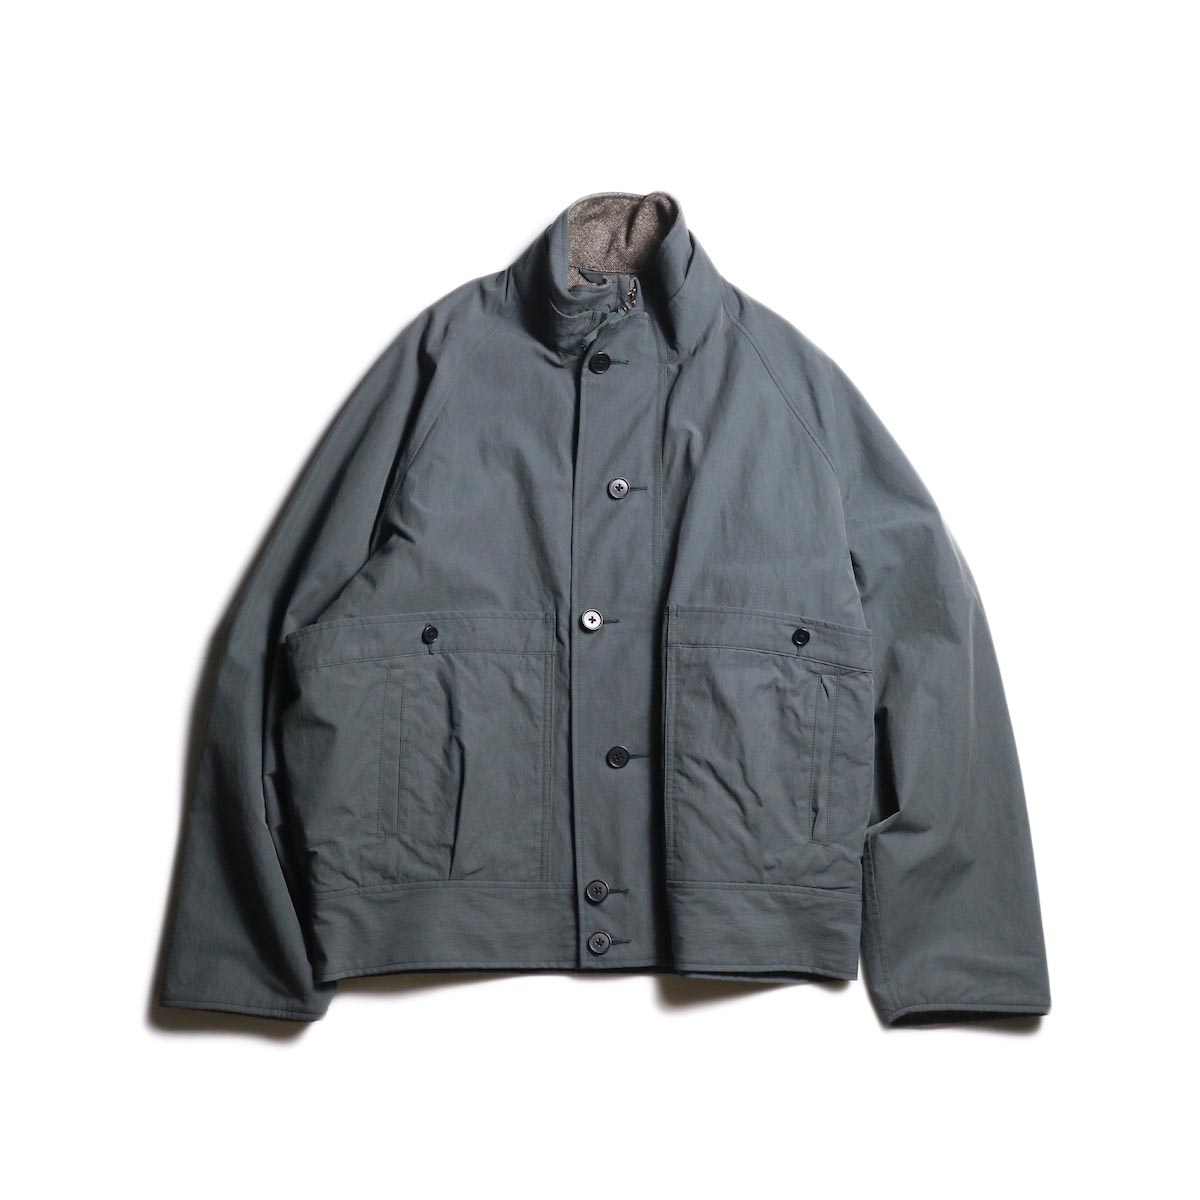 Kaptain Sunshine / Hiker Blouson (Charcoal Gray)